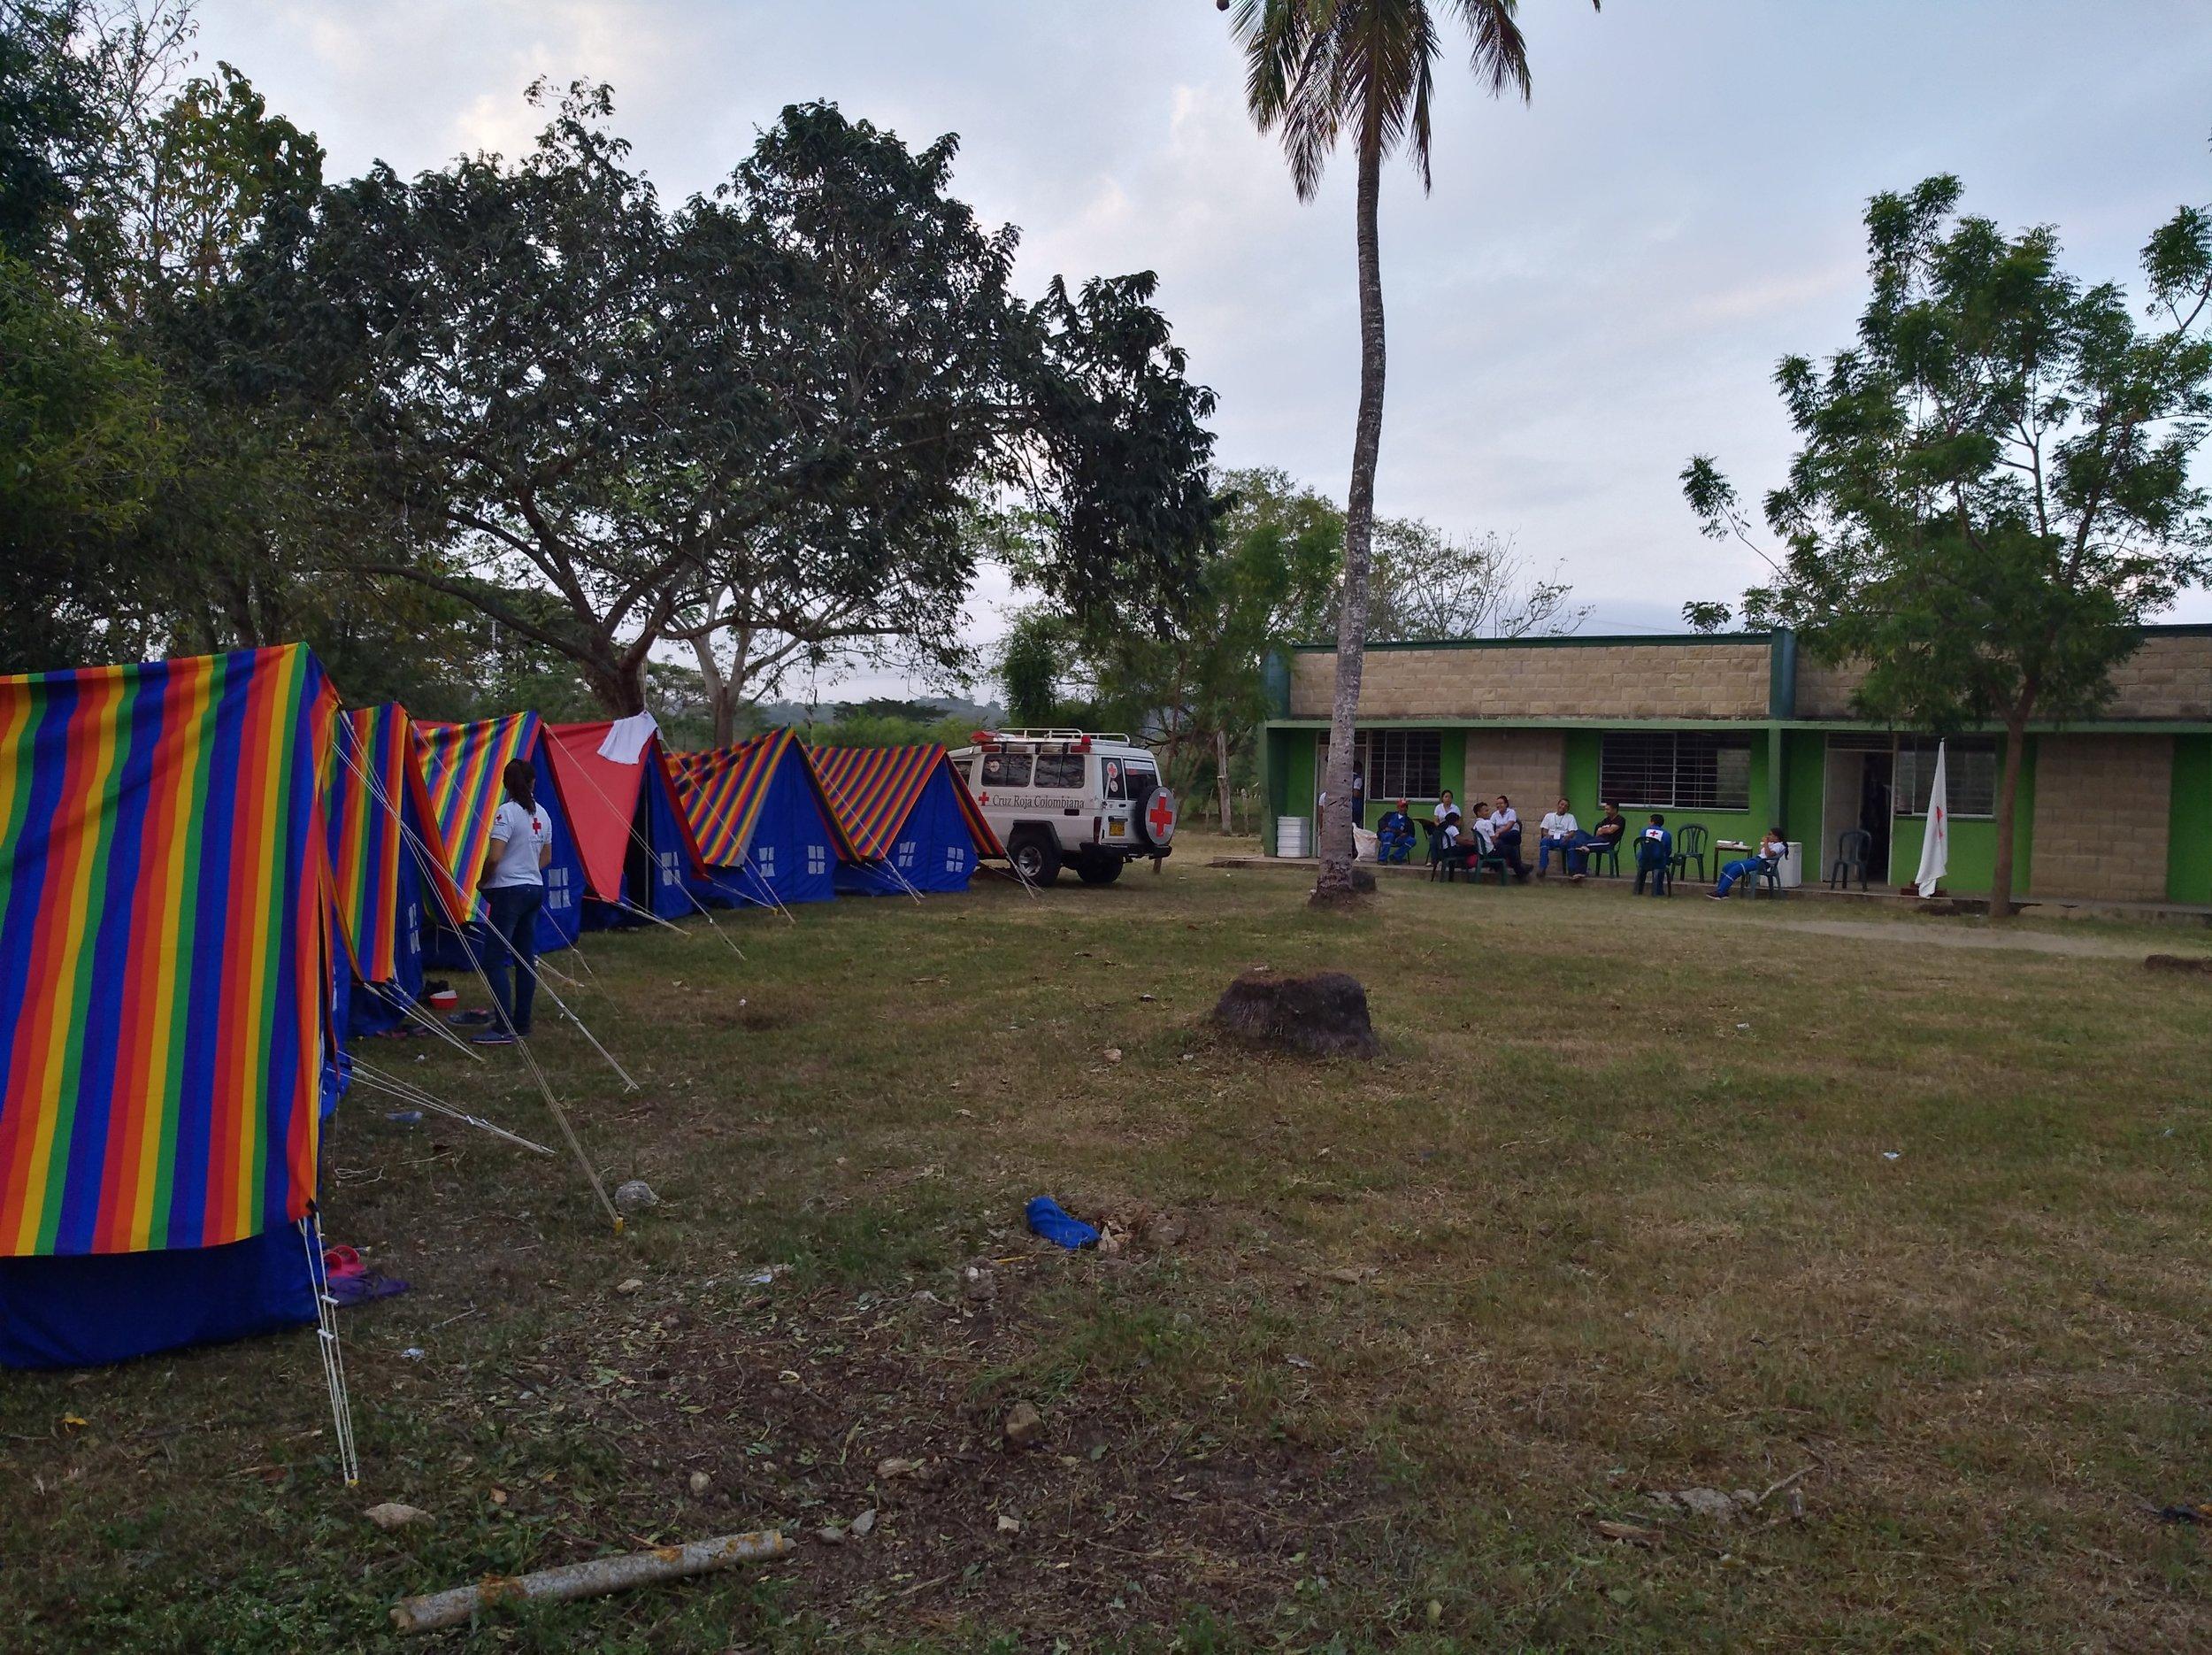 El campamento. /// The camp. Foto: Sofie S. Bele